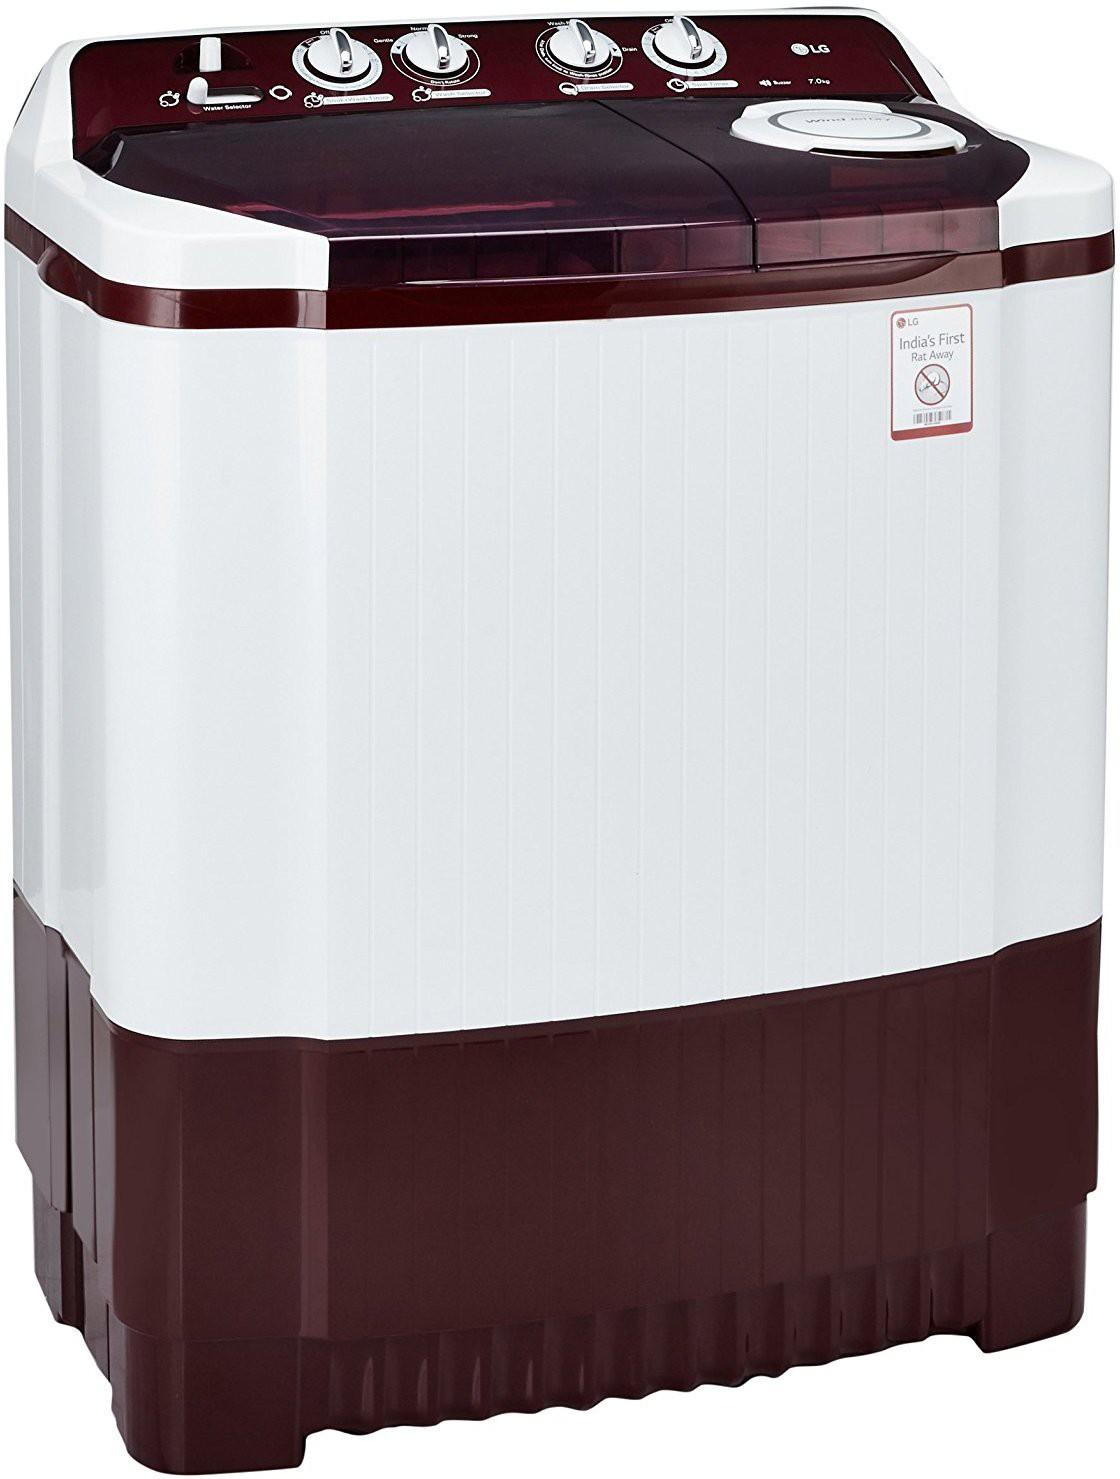 LG 7 kg Semi Automatic Top Load Washing Machine (P8053R3SA) Image